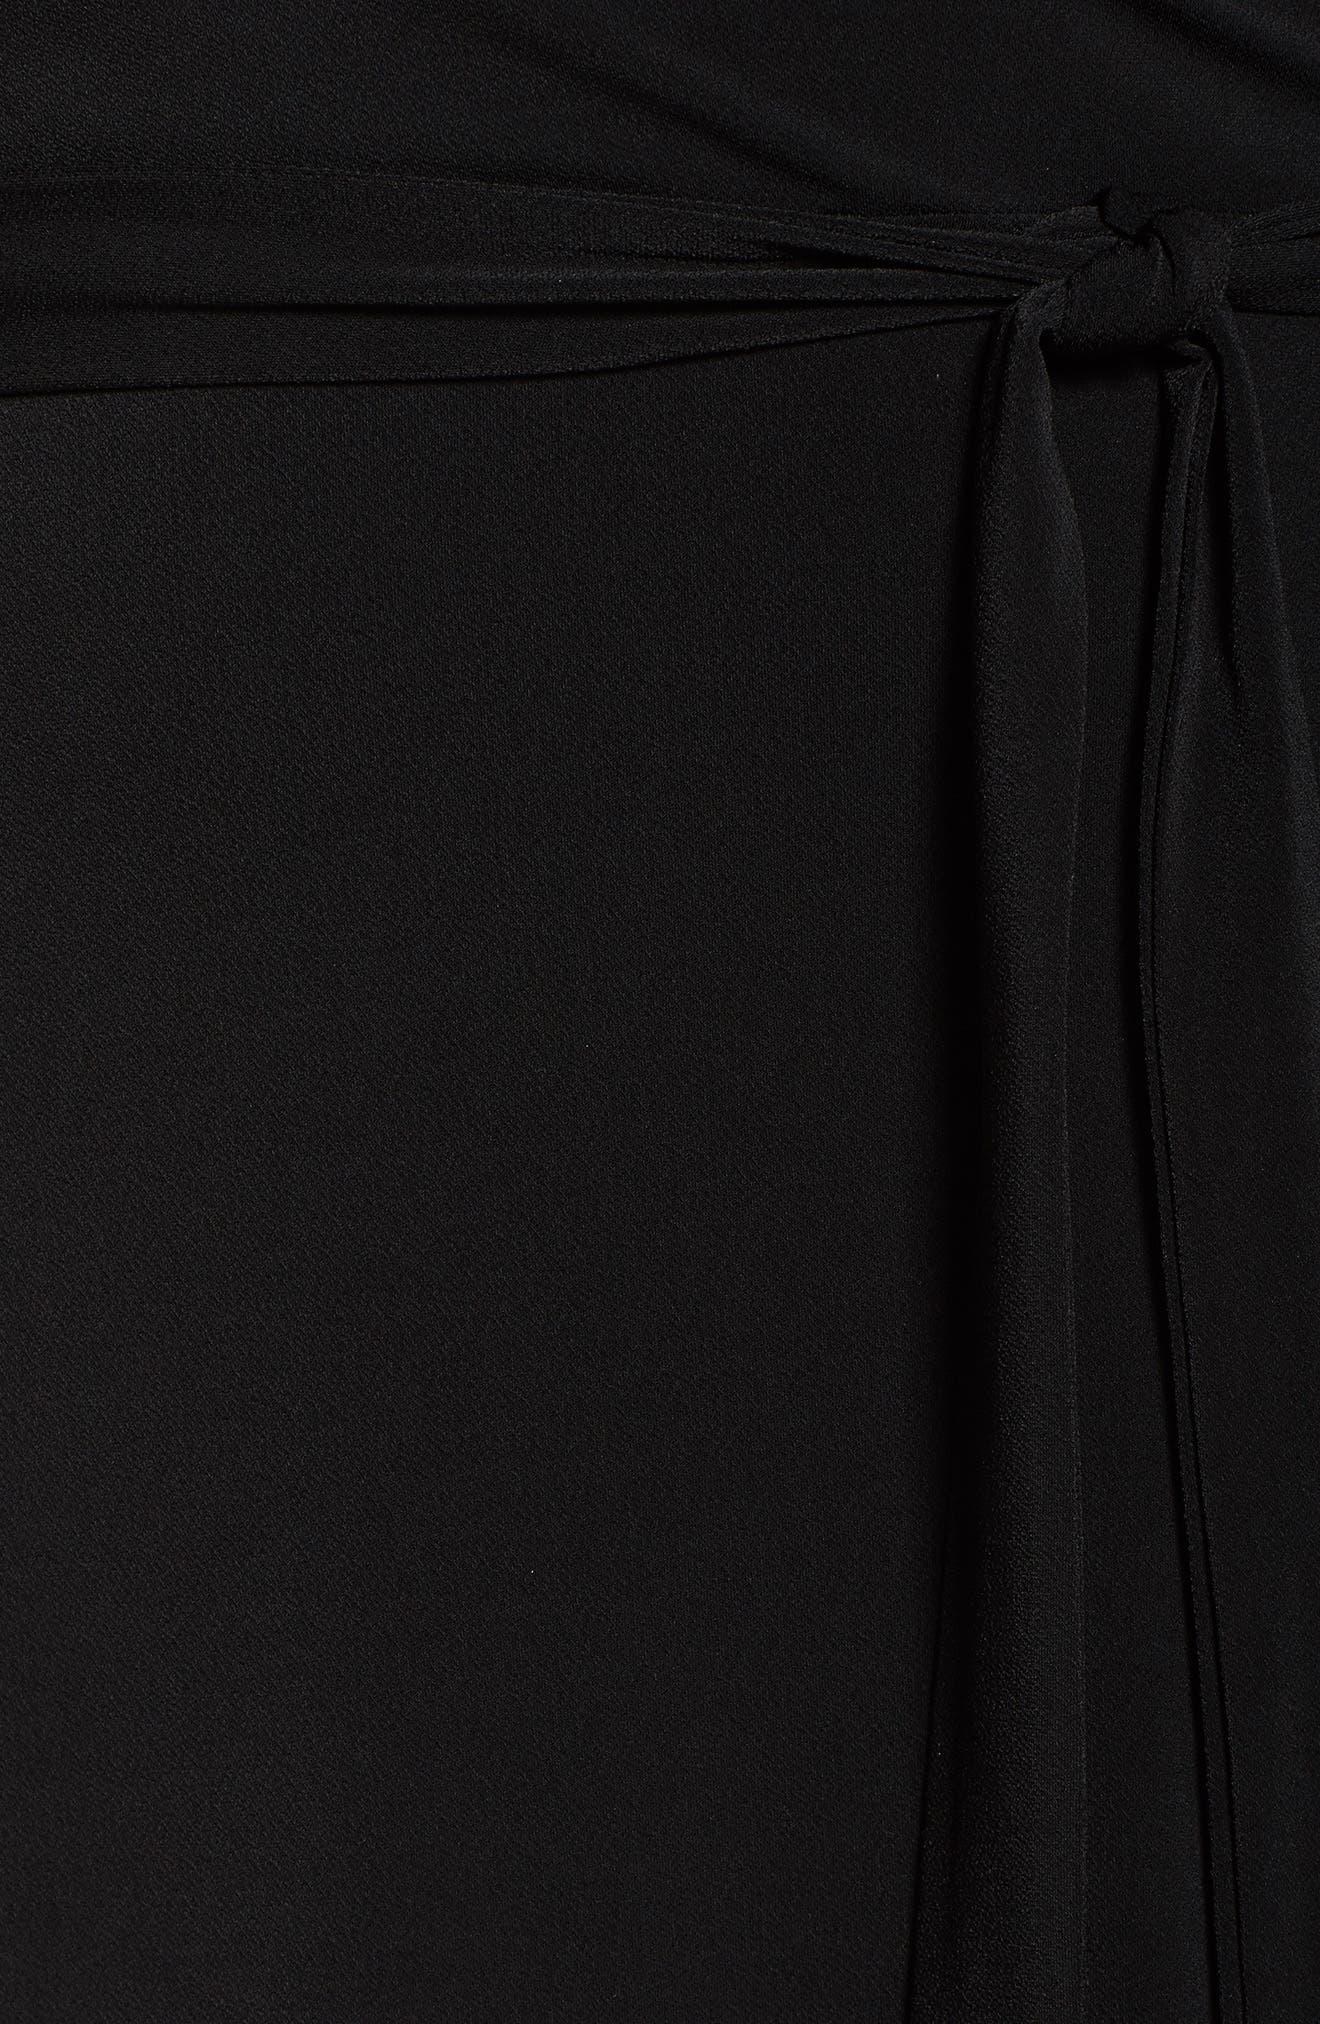 Wrap Dress,                             Alternate thumbnail 6, color,                             Black Crepe